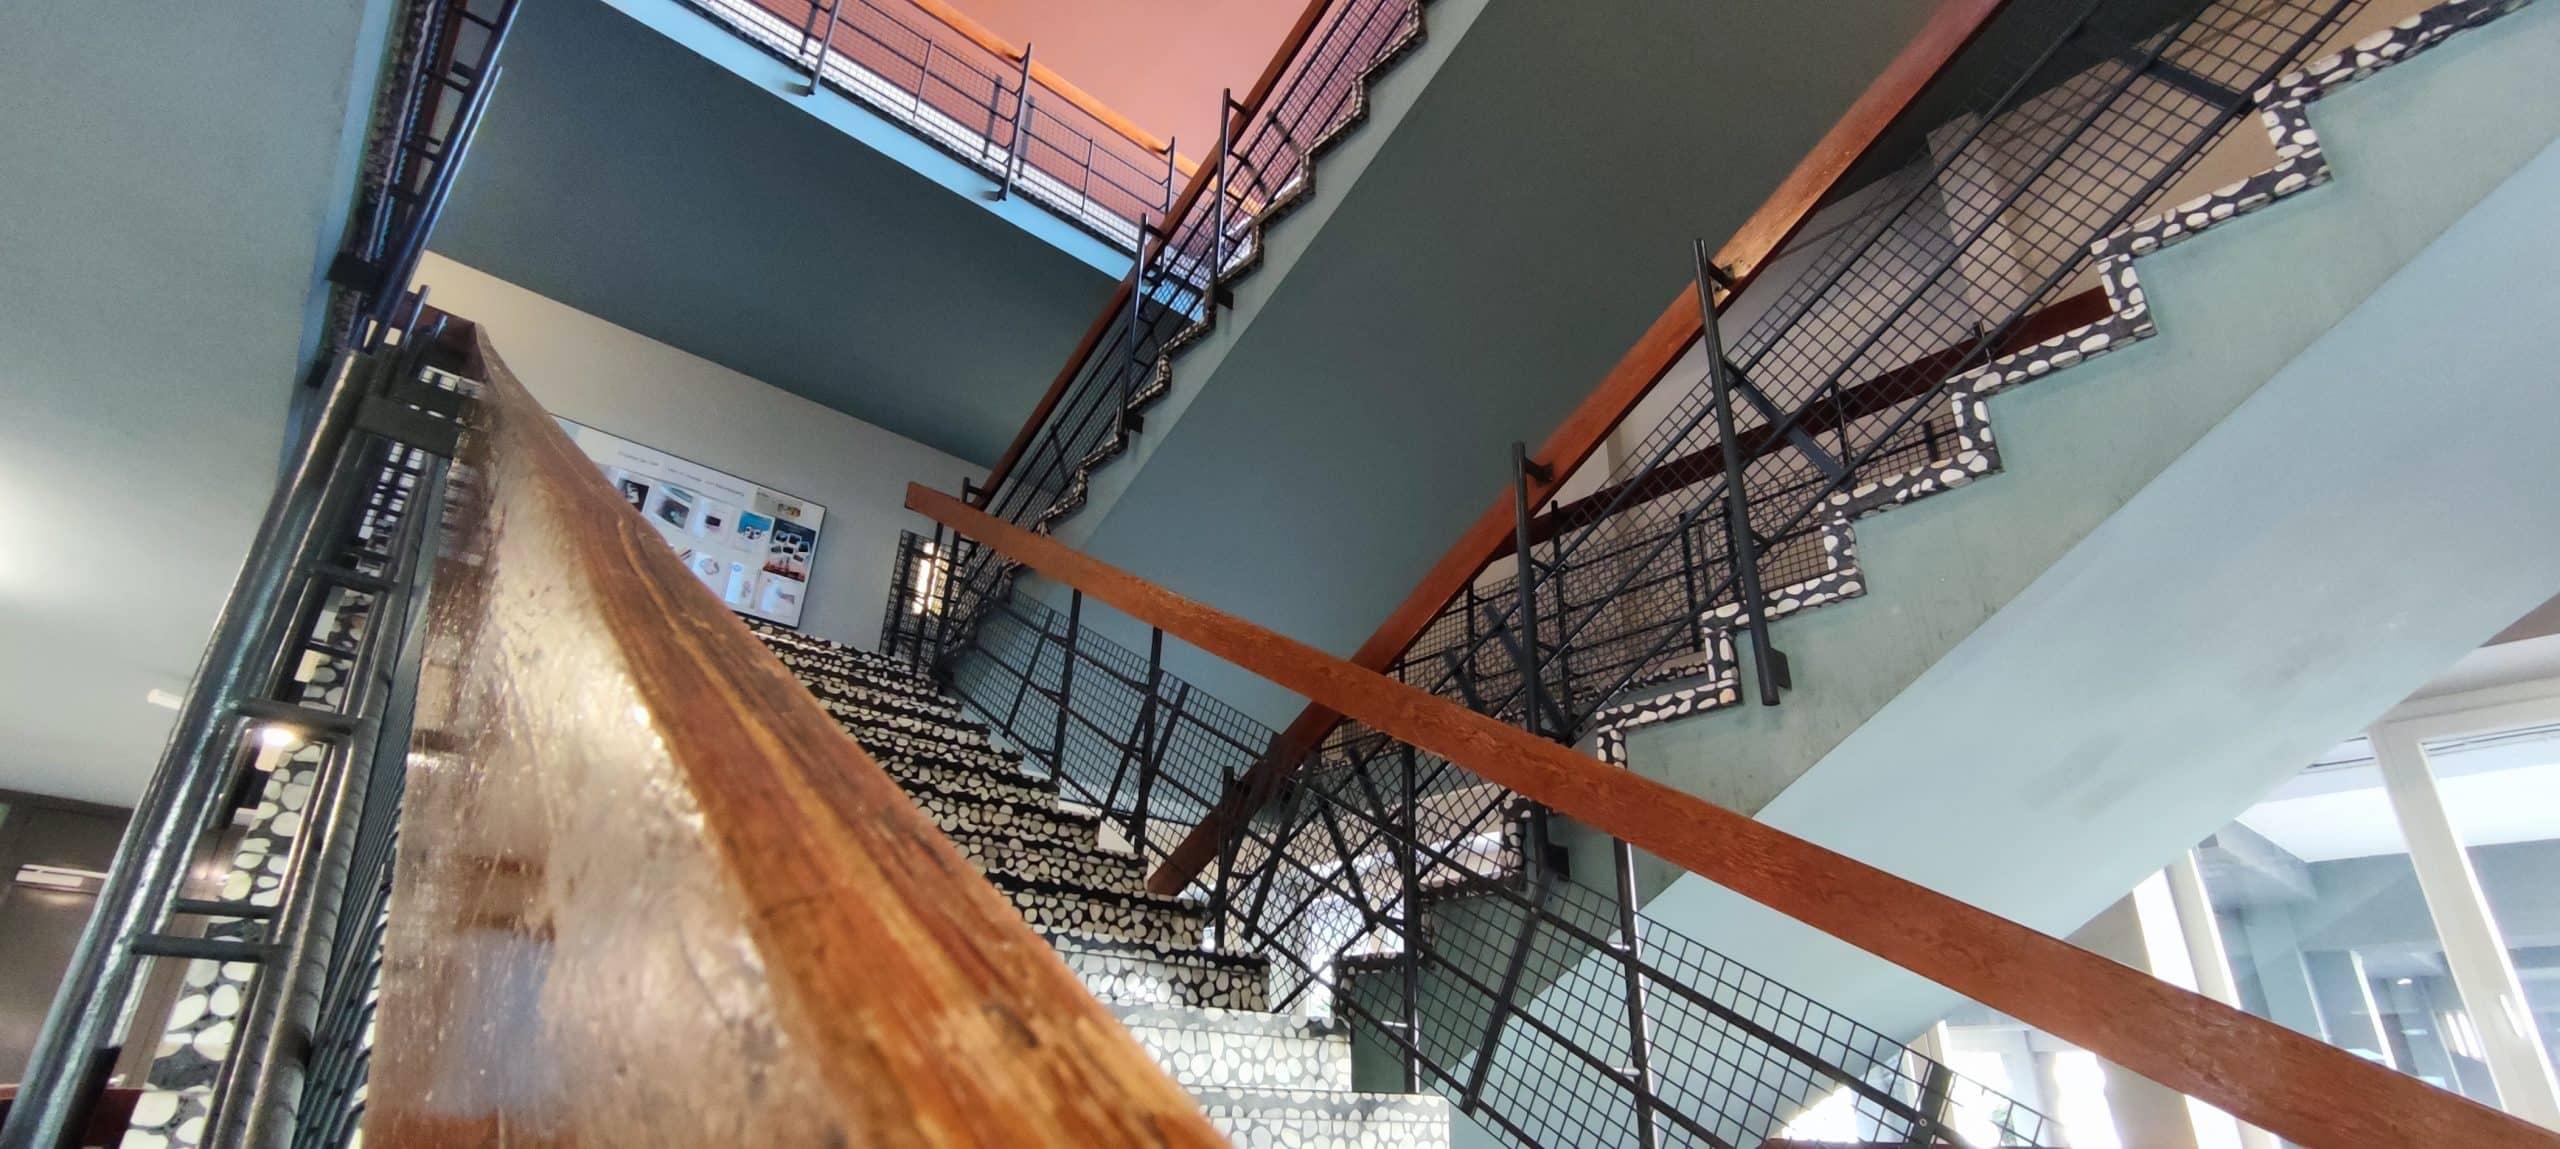 Dr. Zimmermannsche Wirtschaftsschule in Koblenz Treppenhaus aus Erdgeschoss-Perspektive